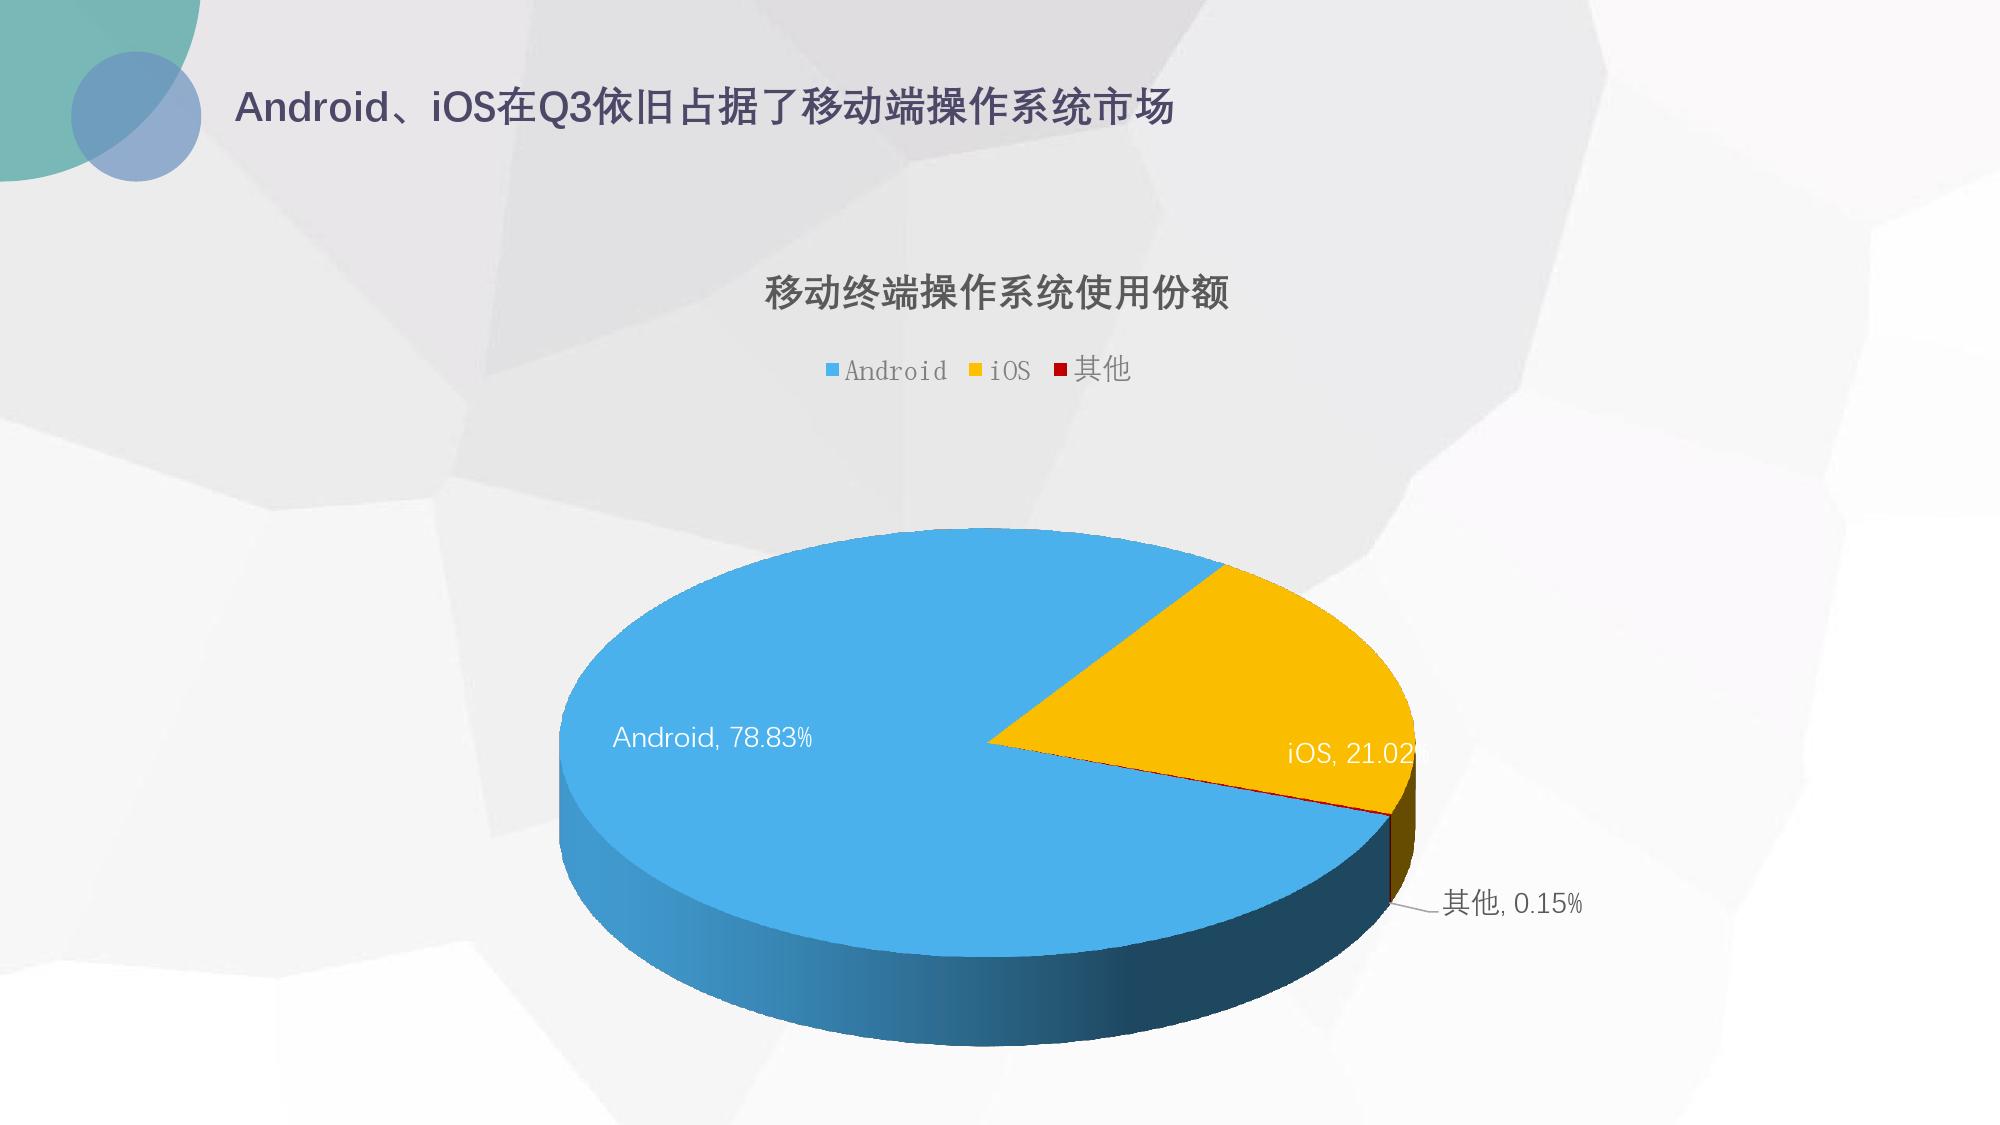 %e7%bd%91%e5%ae%bf%ef%bc%9a2016%e5%b9%b4q3%e4%b8%ad%e5%9b%bd%e4%ba%92%e8%81%94%e7%bd%91%e5%8f%91%e5%b1%95%e6%8a%a5%e5%91%8a_000037